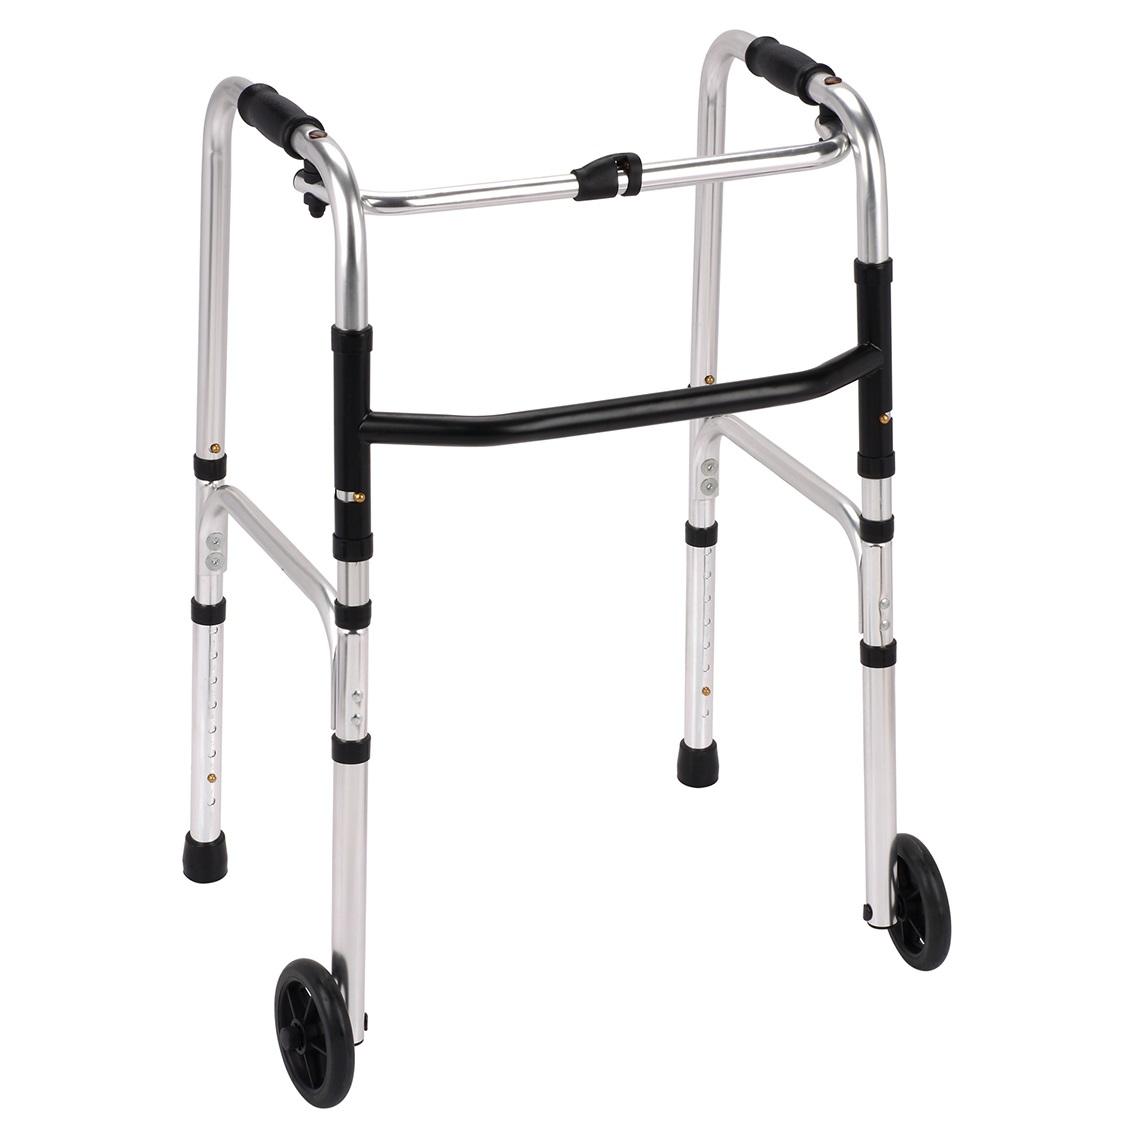 Folding Walking Frame with wheels